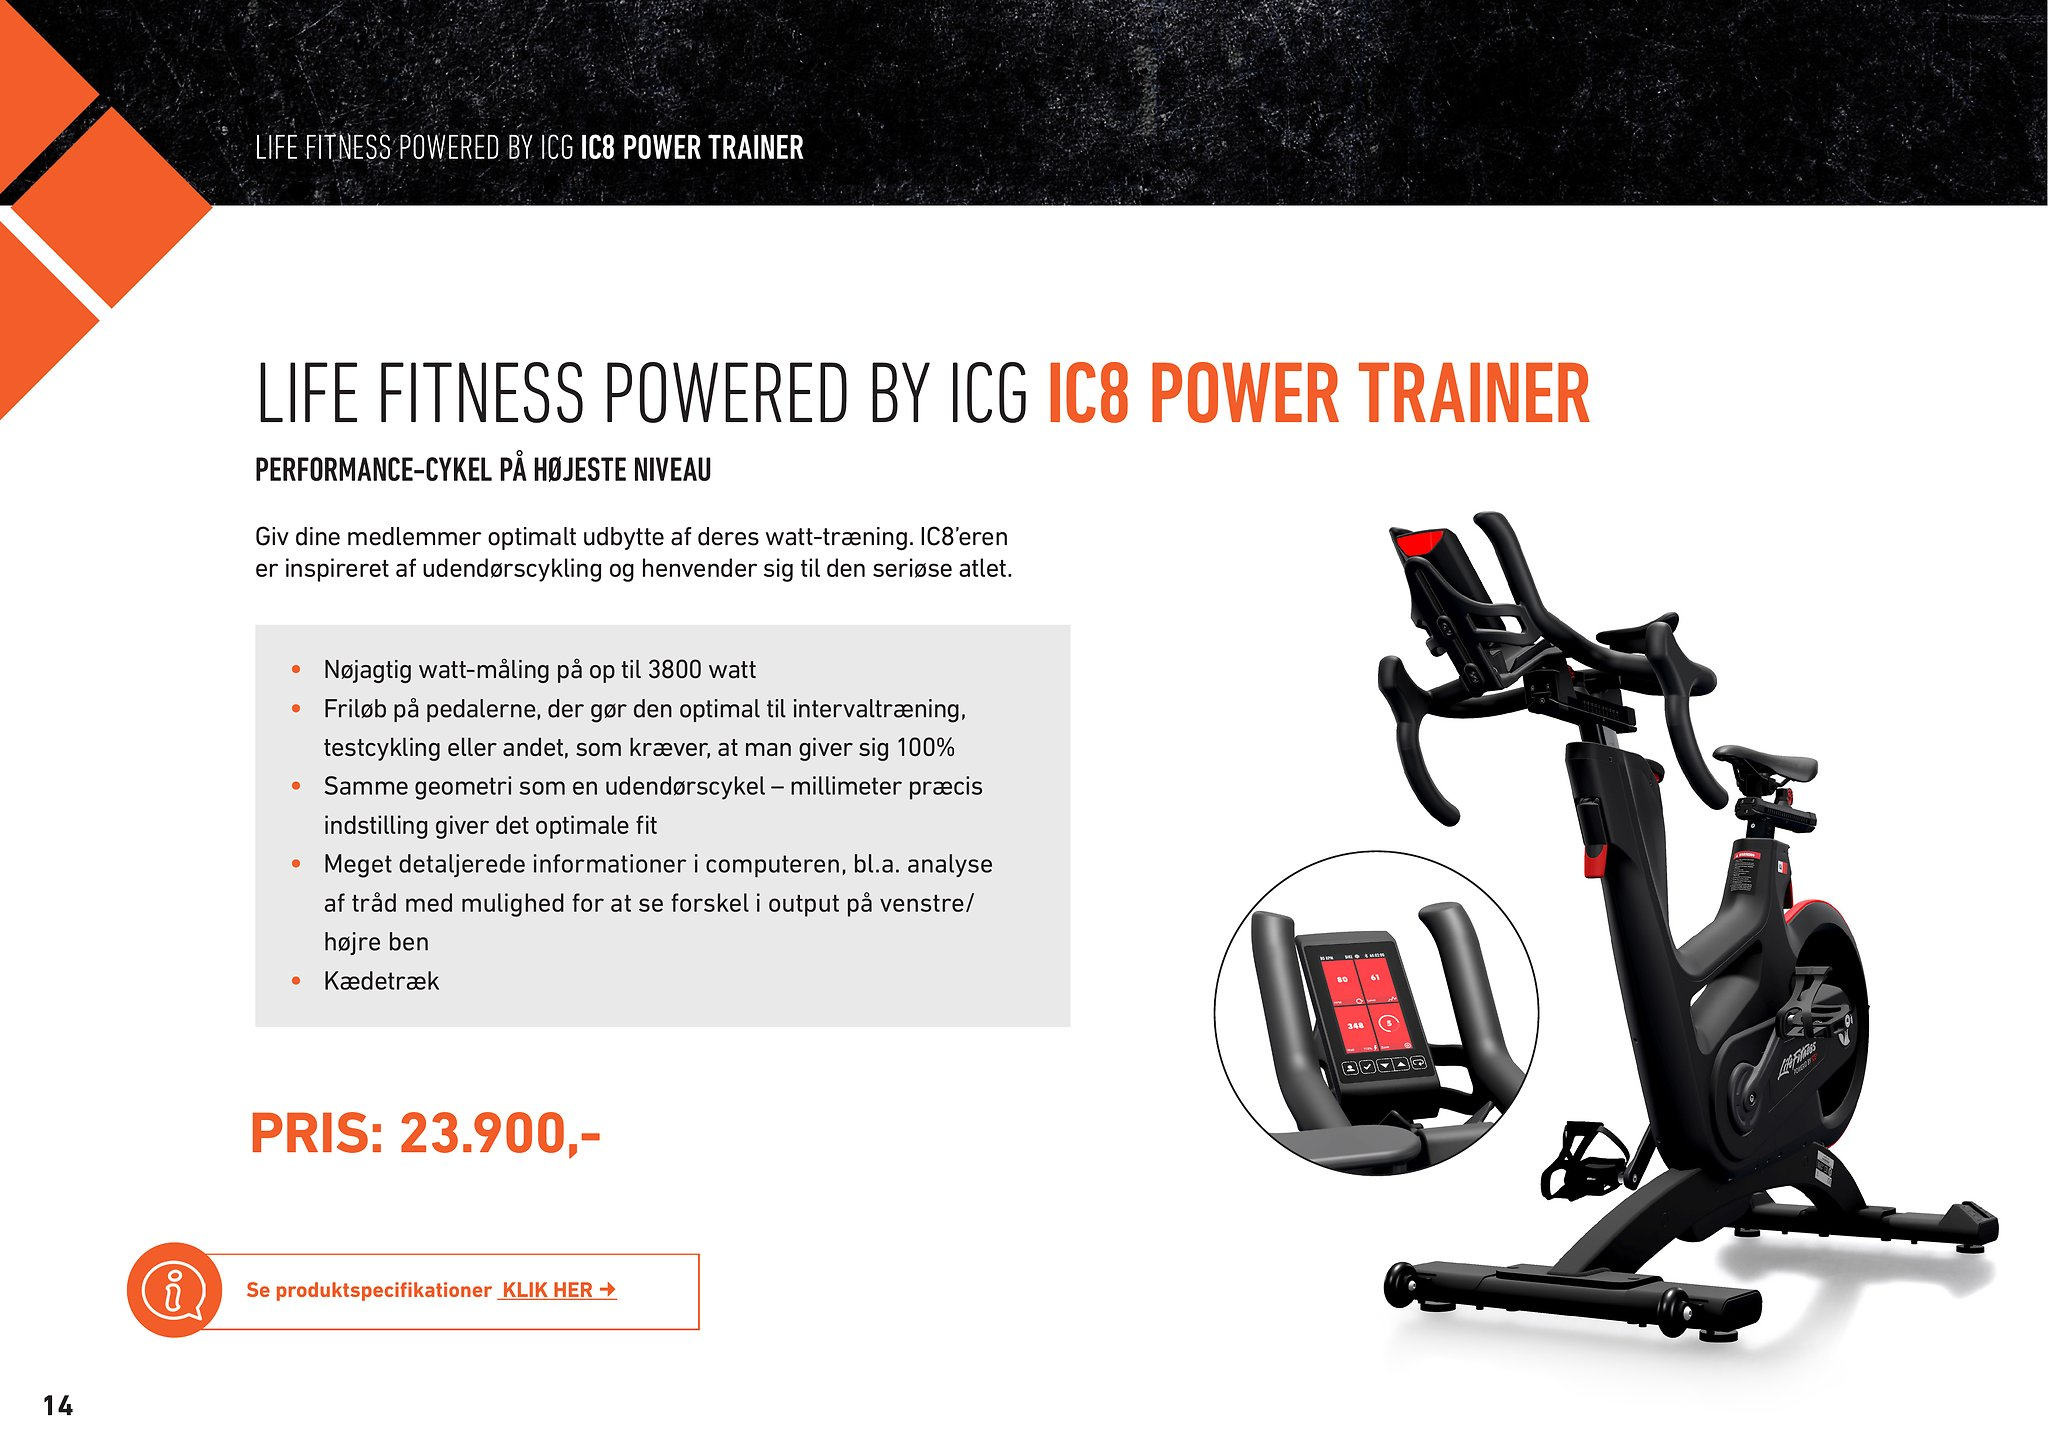 IC8 Power Trainer – HIIT – MedicSport